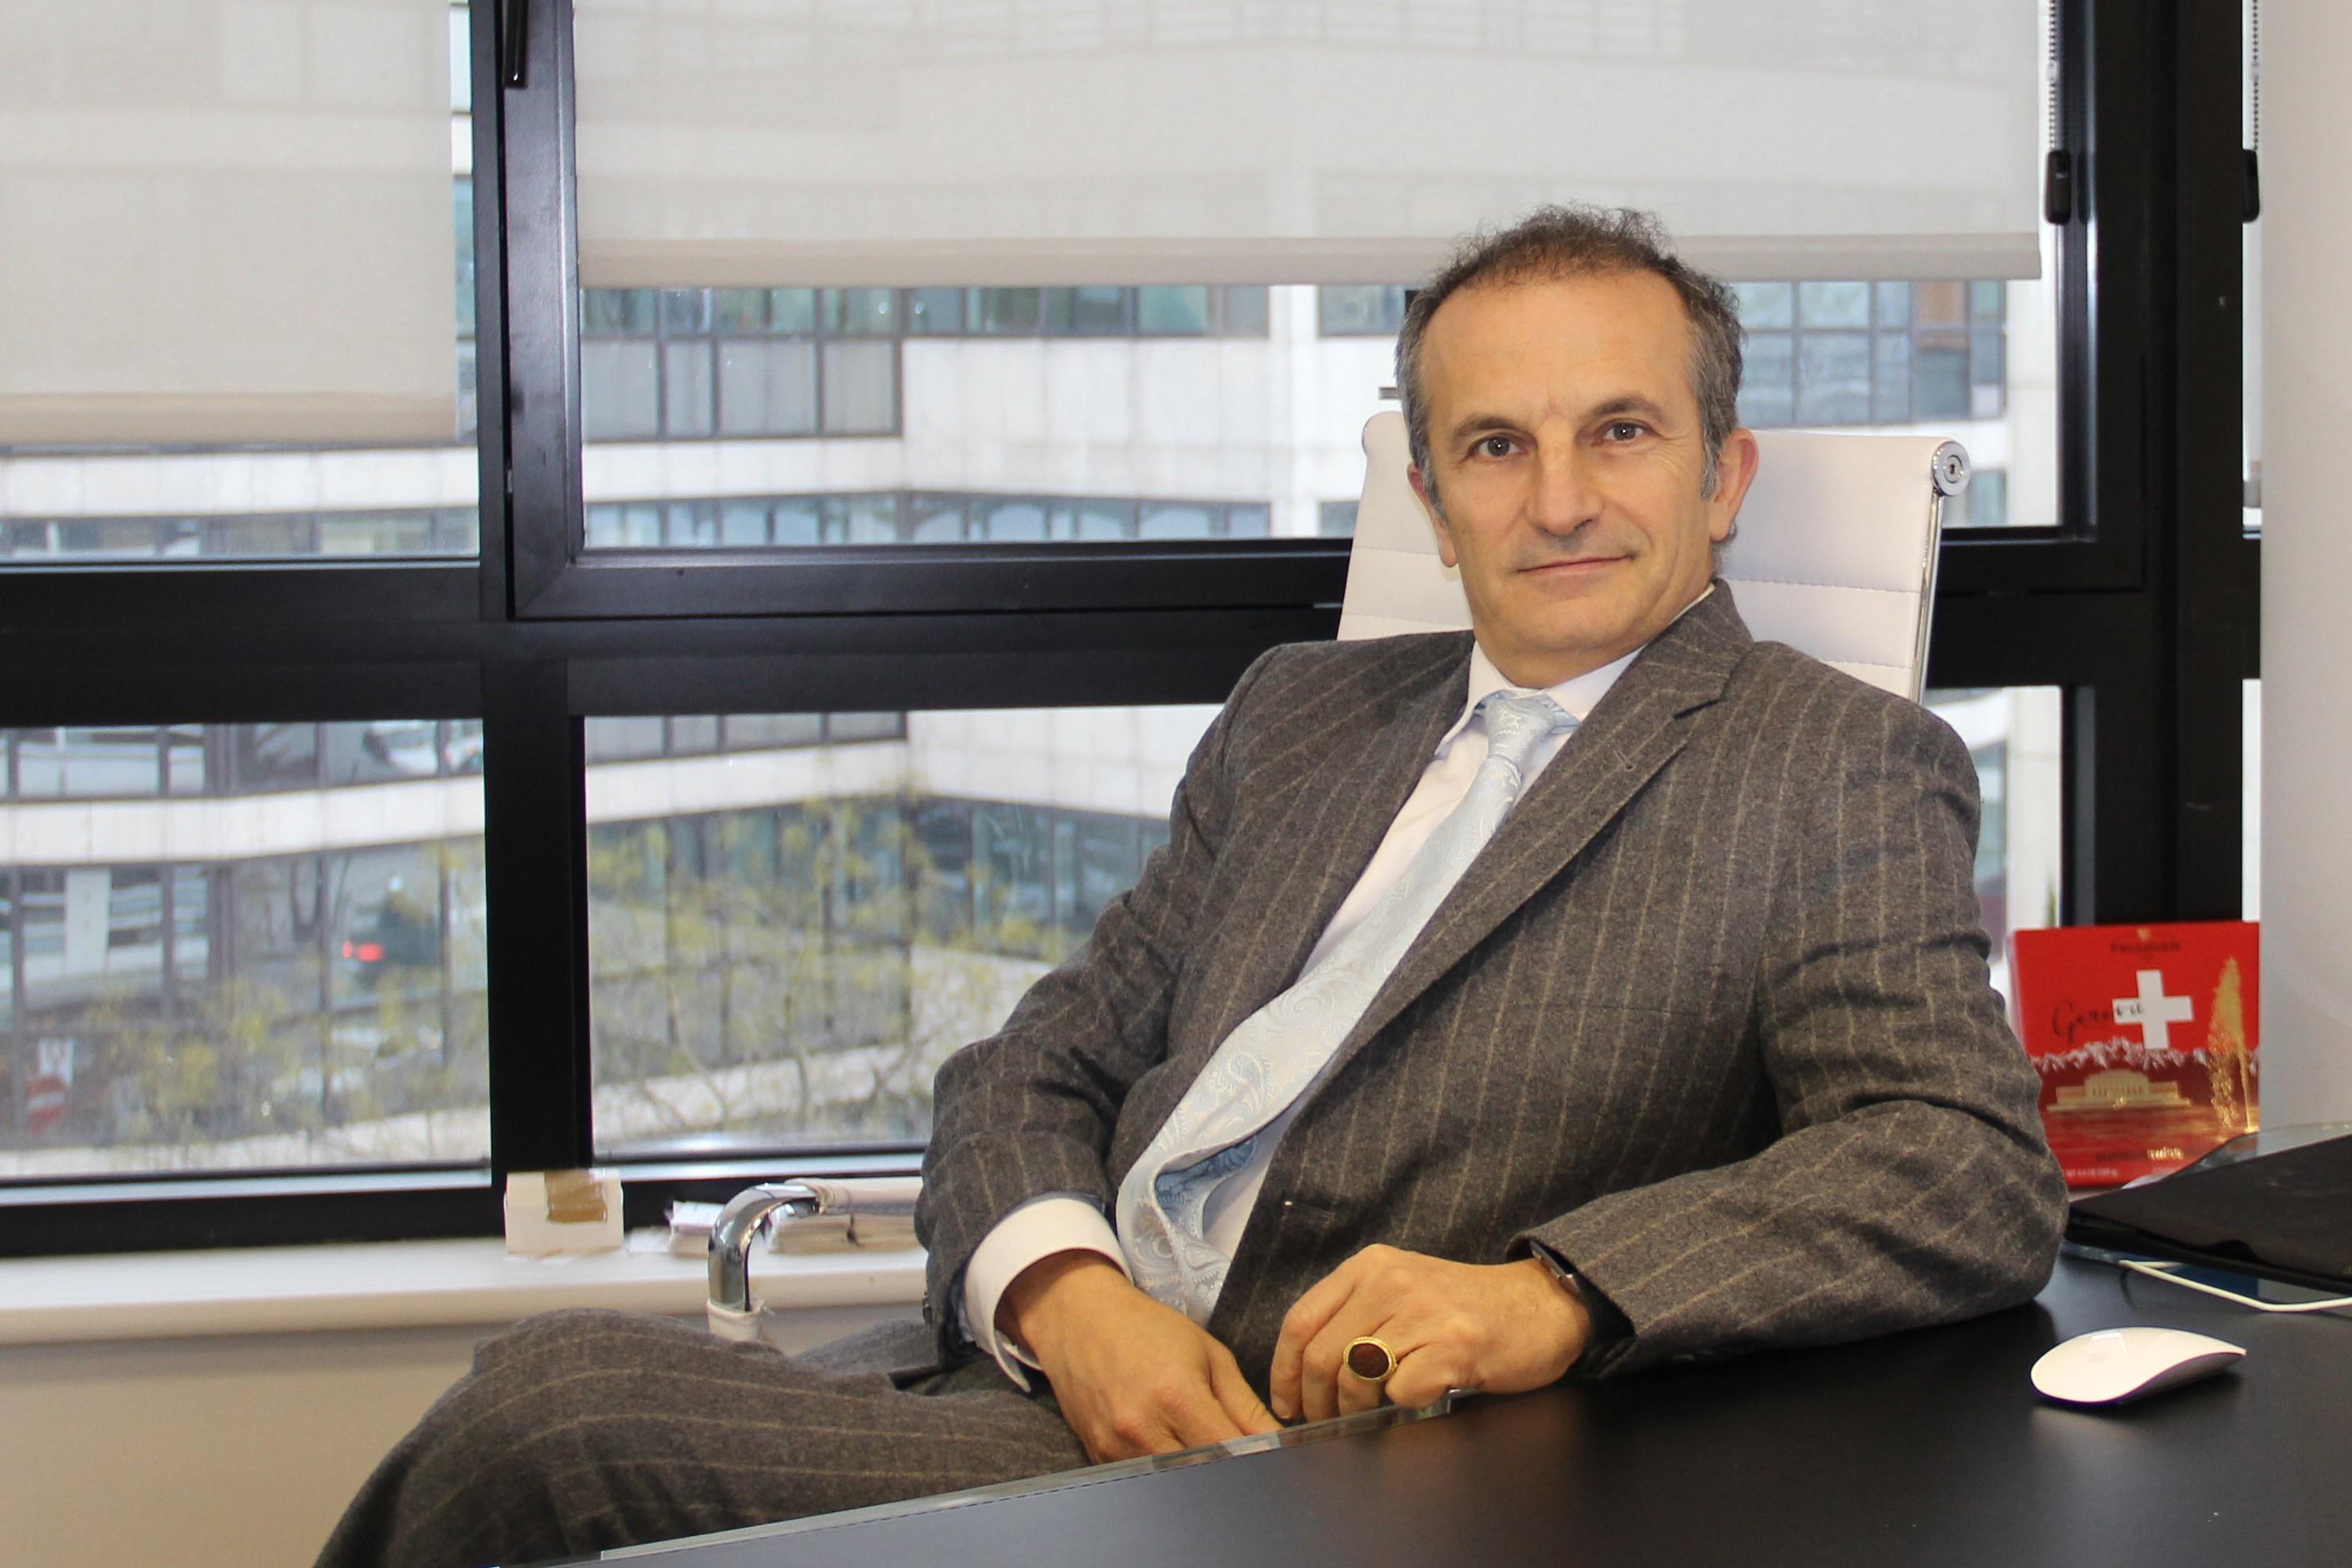 Frédéric Bonan